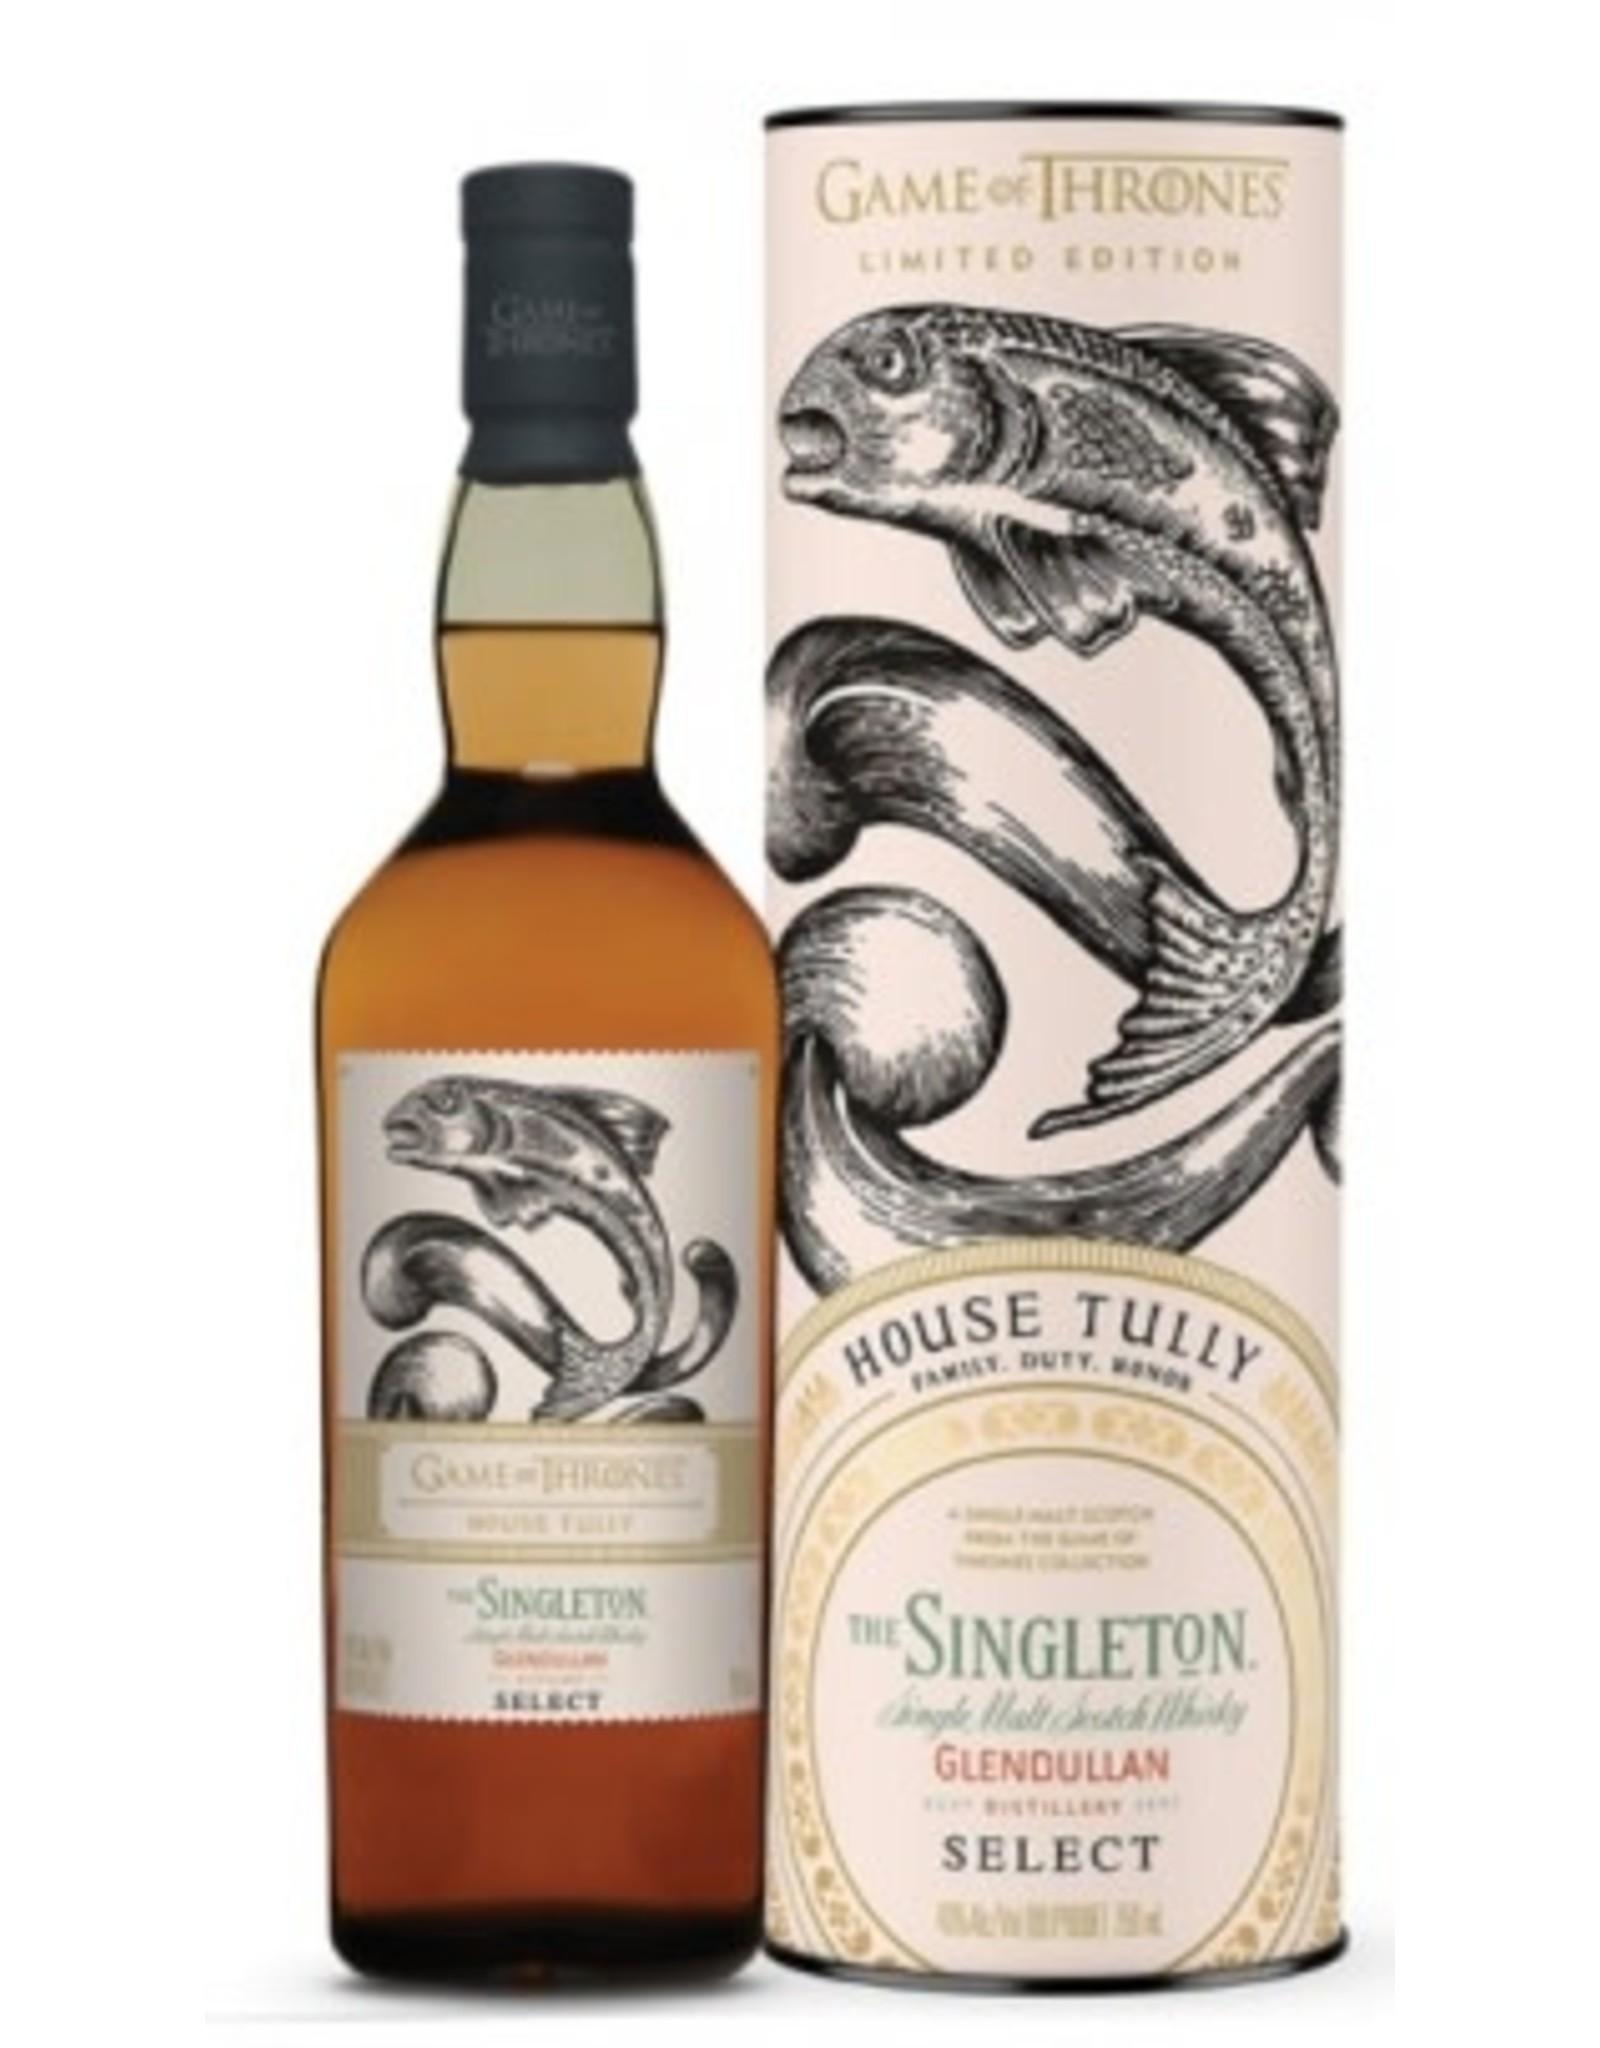 Singleton, House Tully